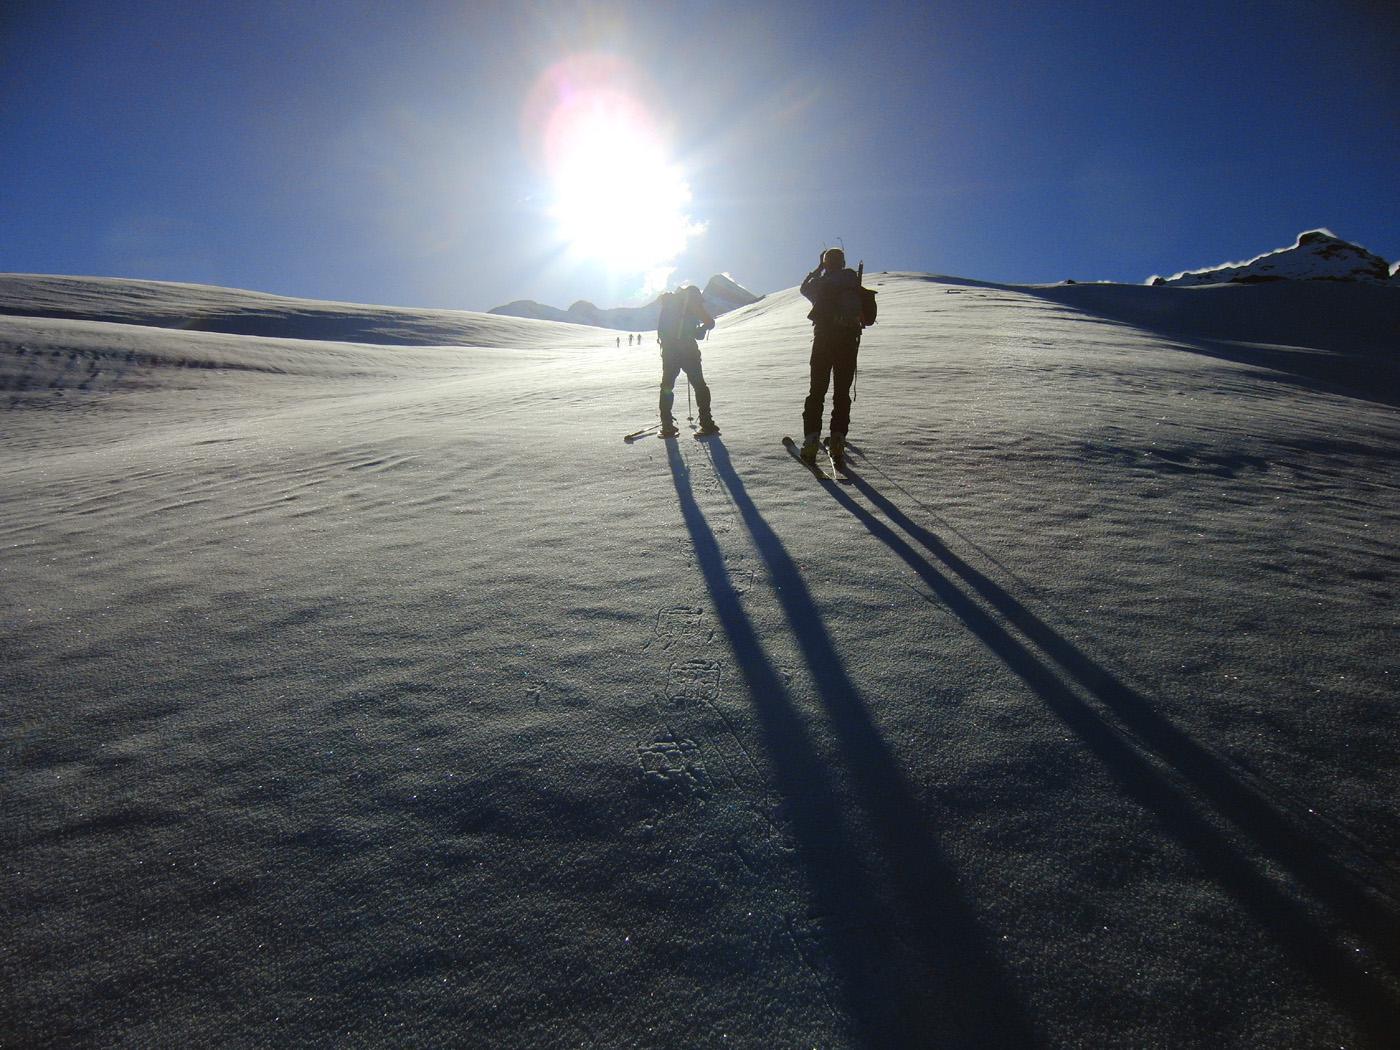 Sul ghiacciaio neve ok